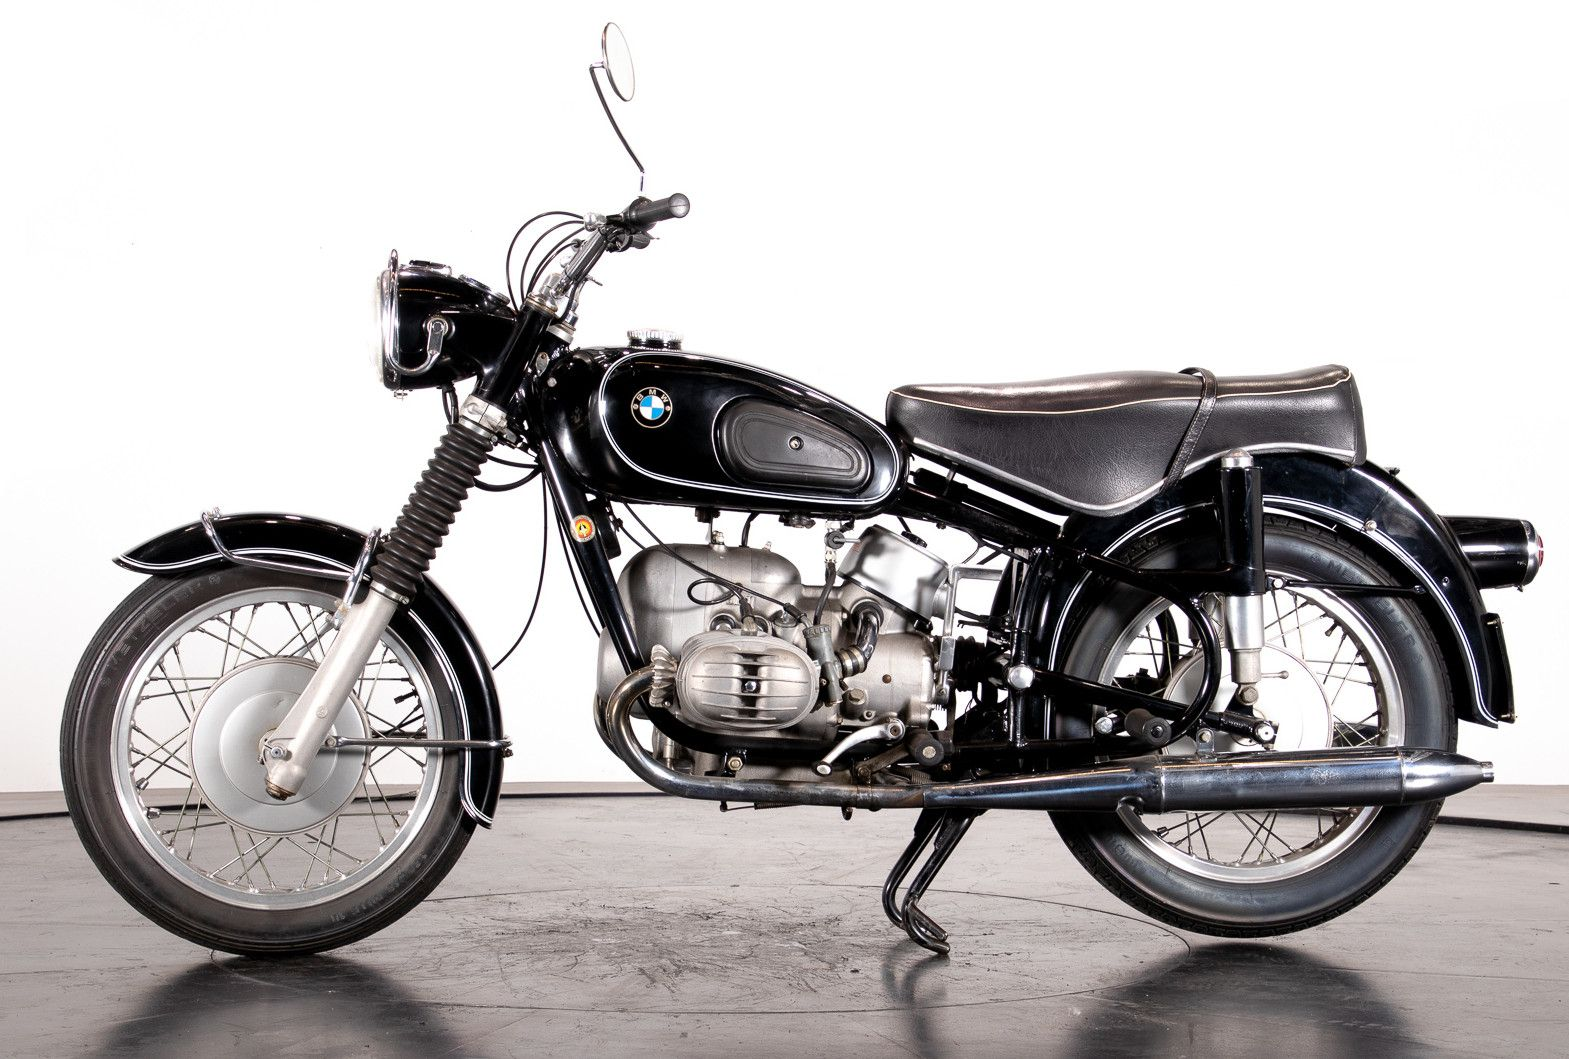 1969 BMW 500 45130